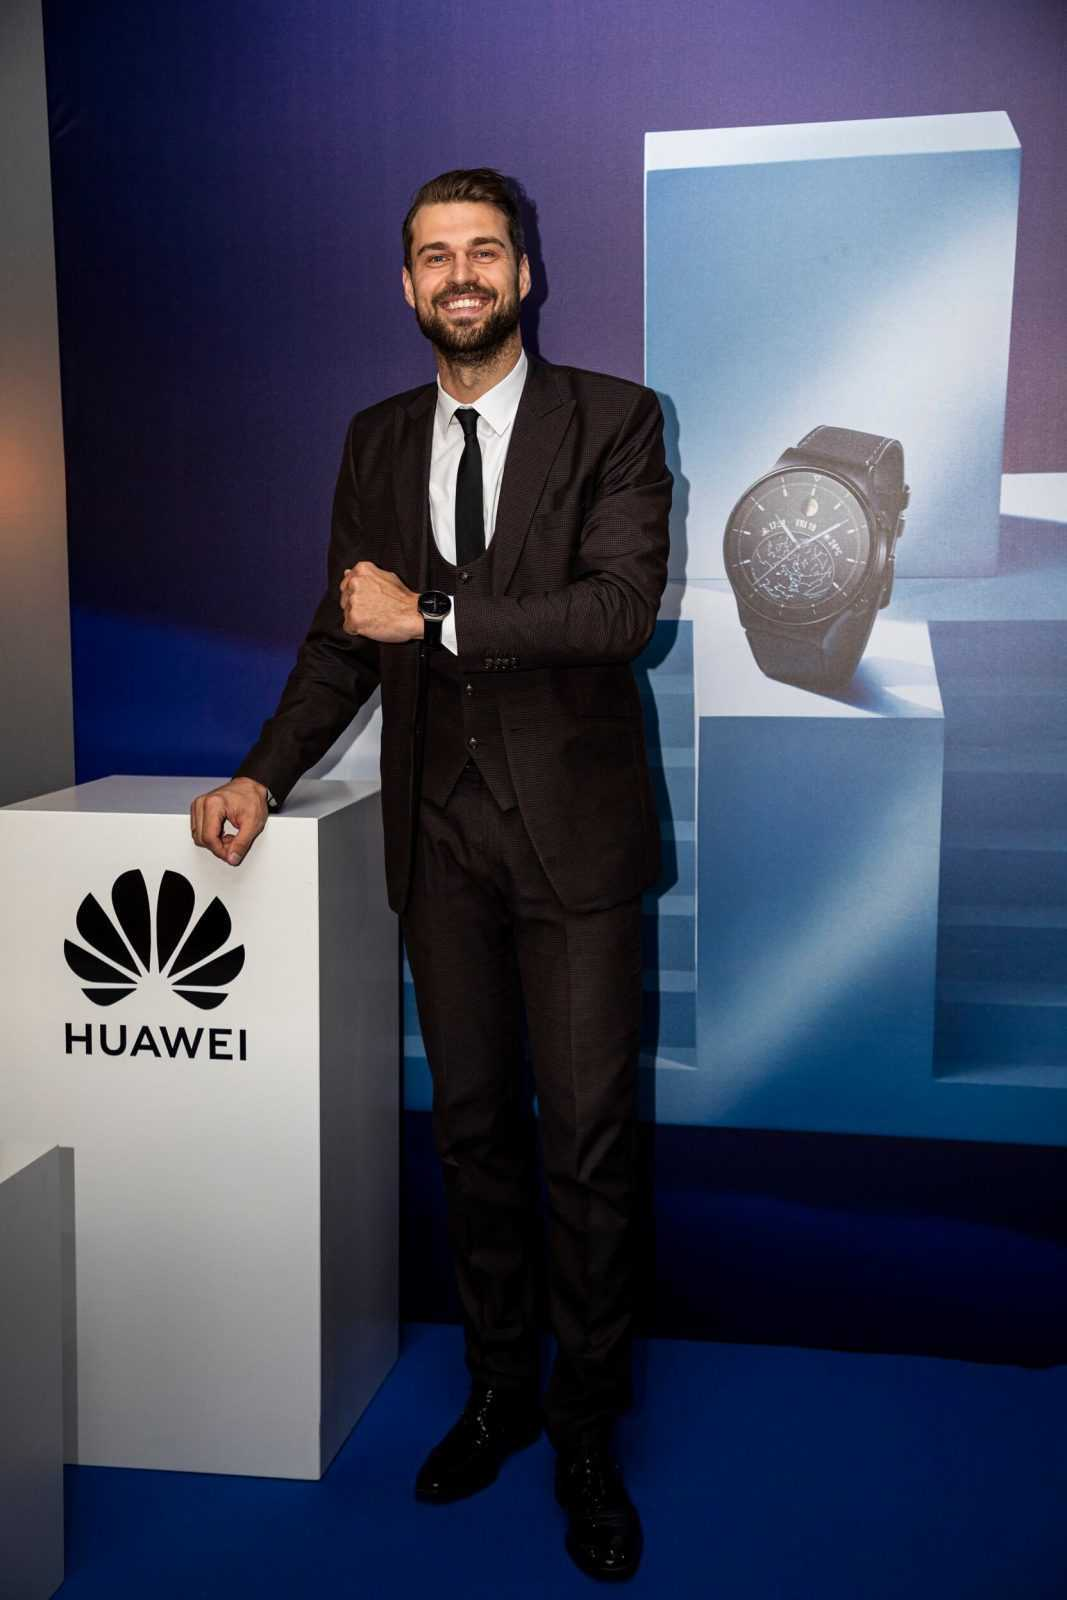 Huawei prezentacija un modes skate 3 (1)